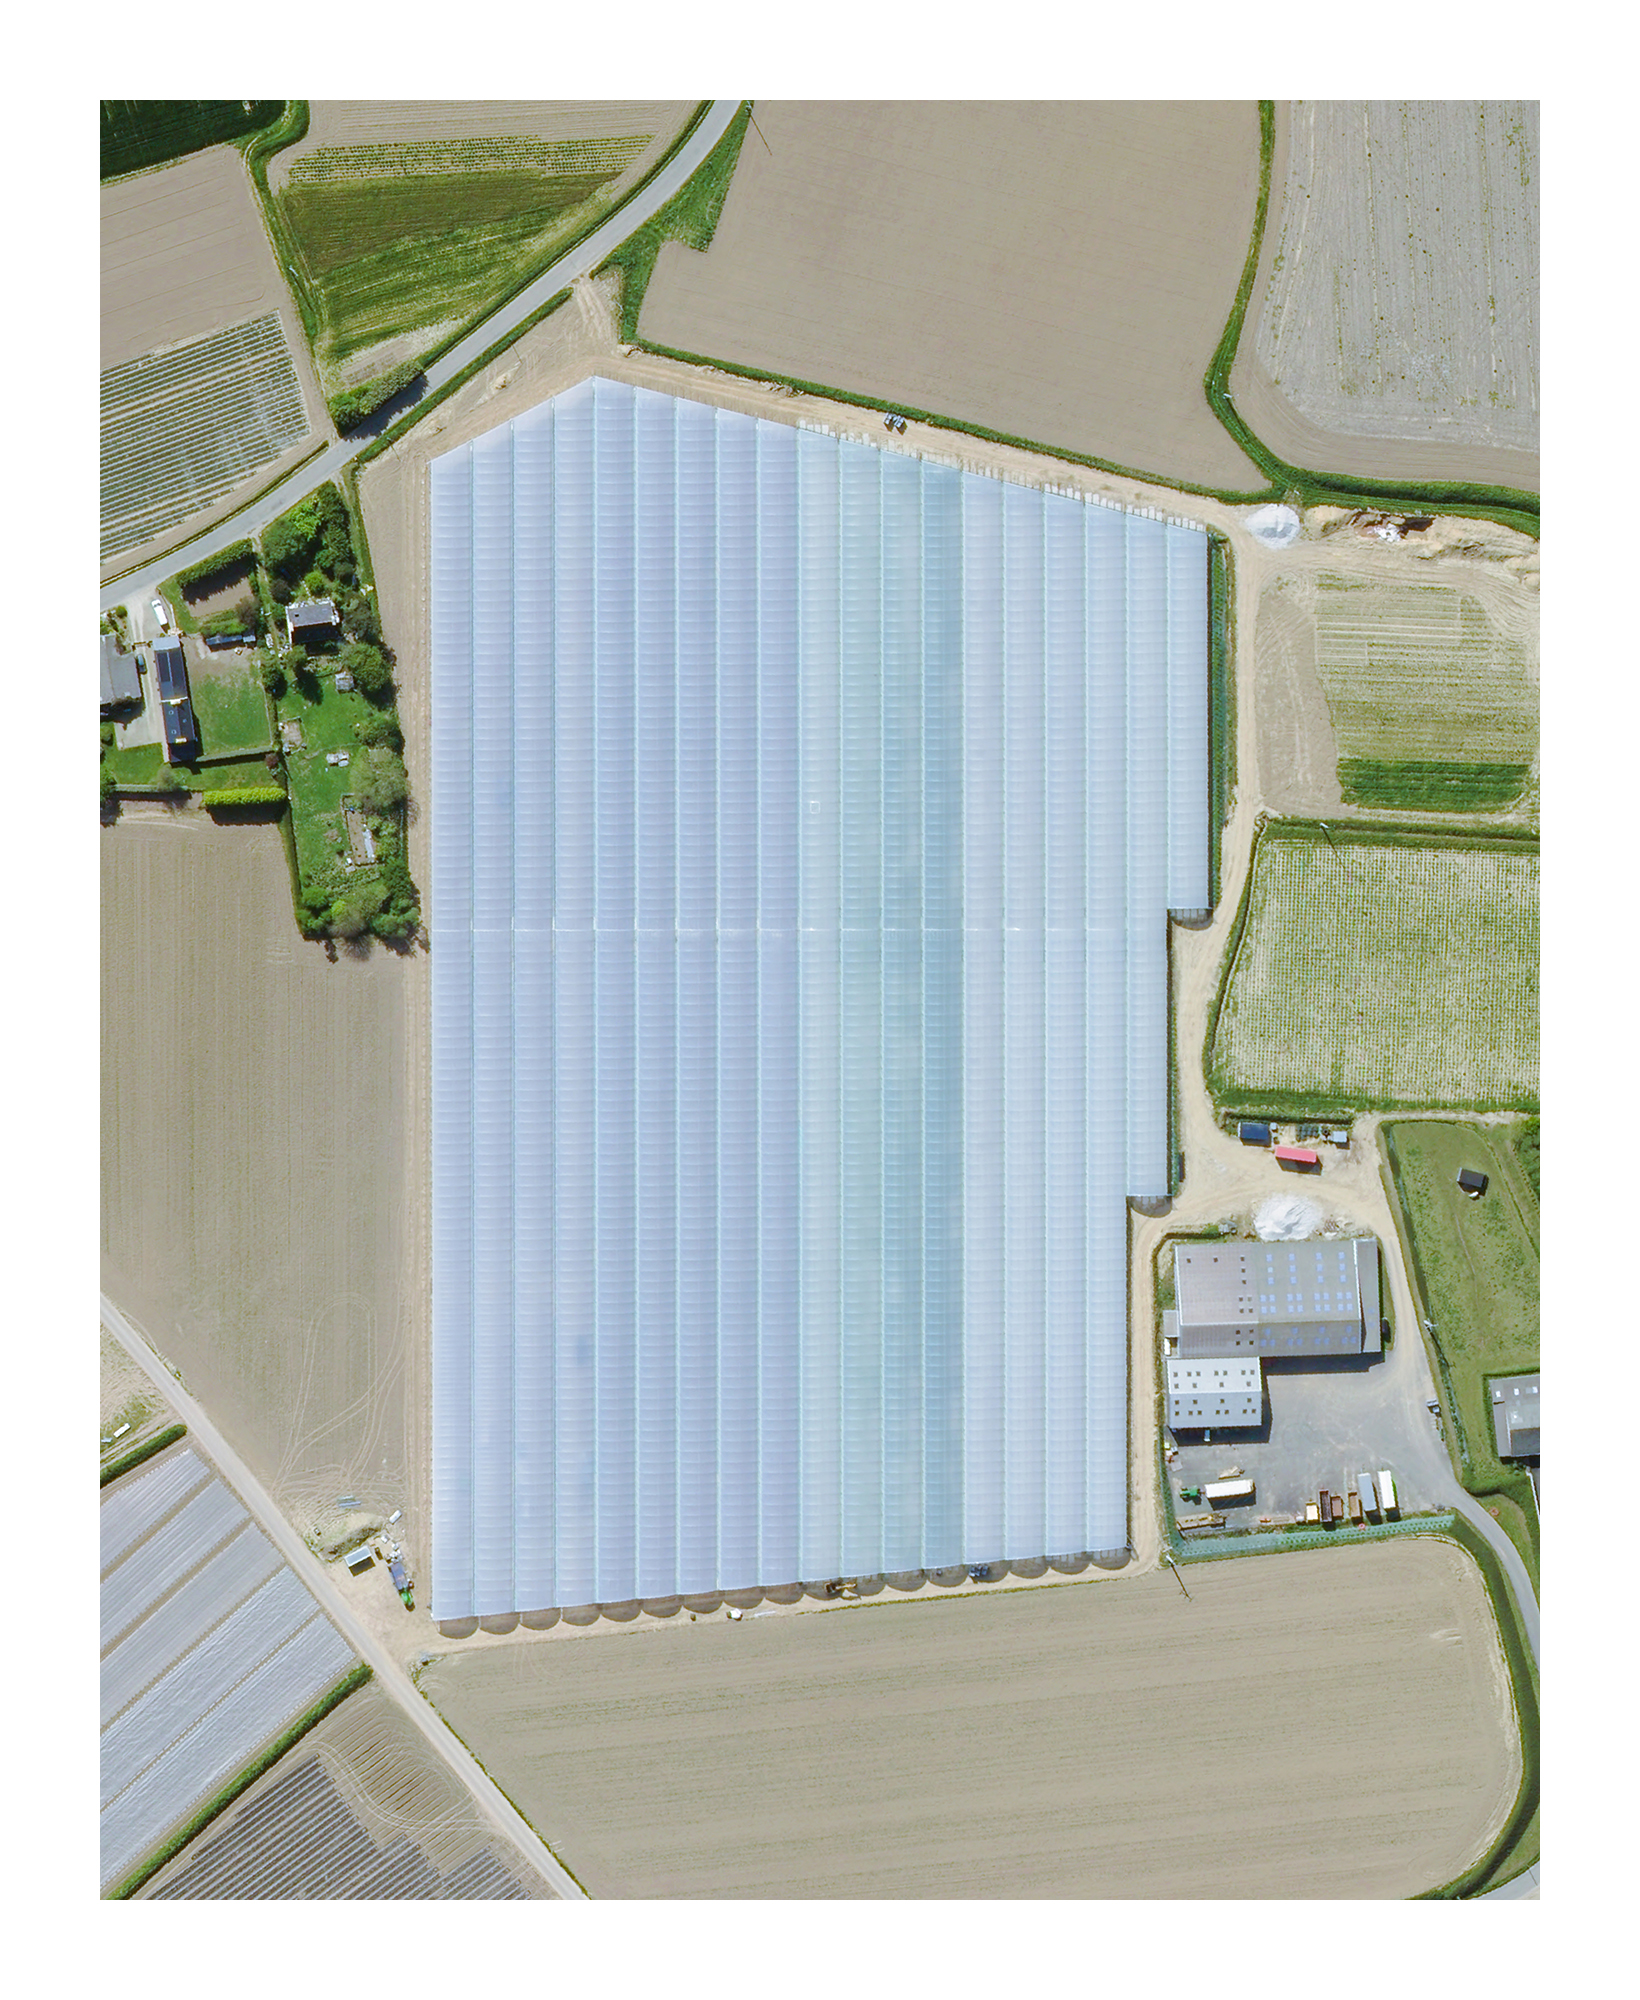 Farming Patterns II